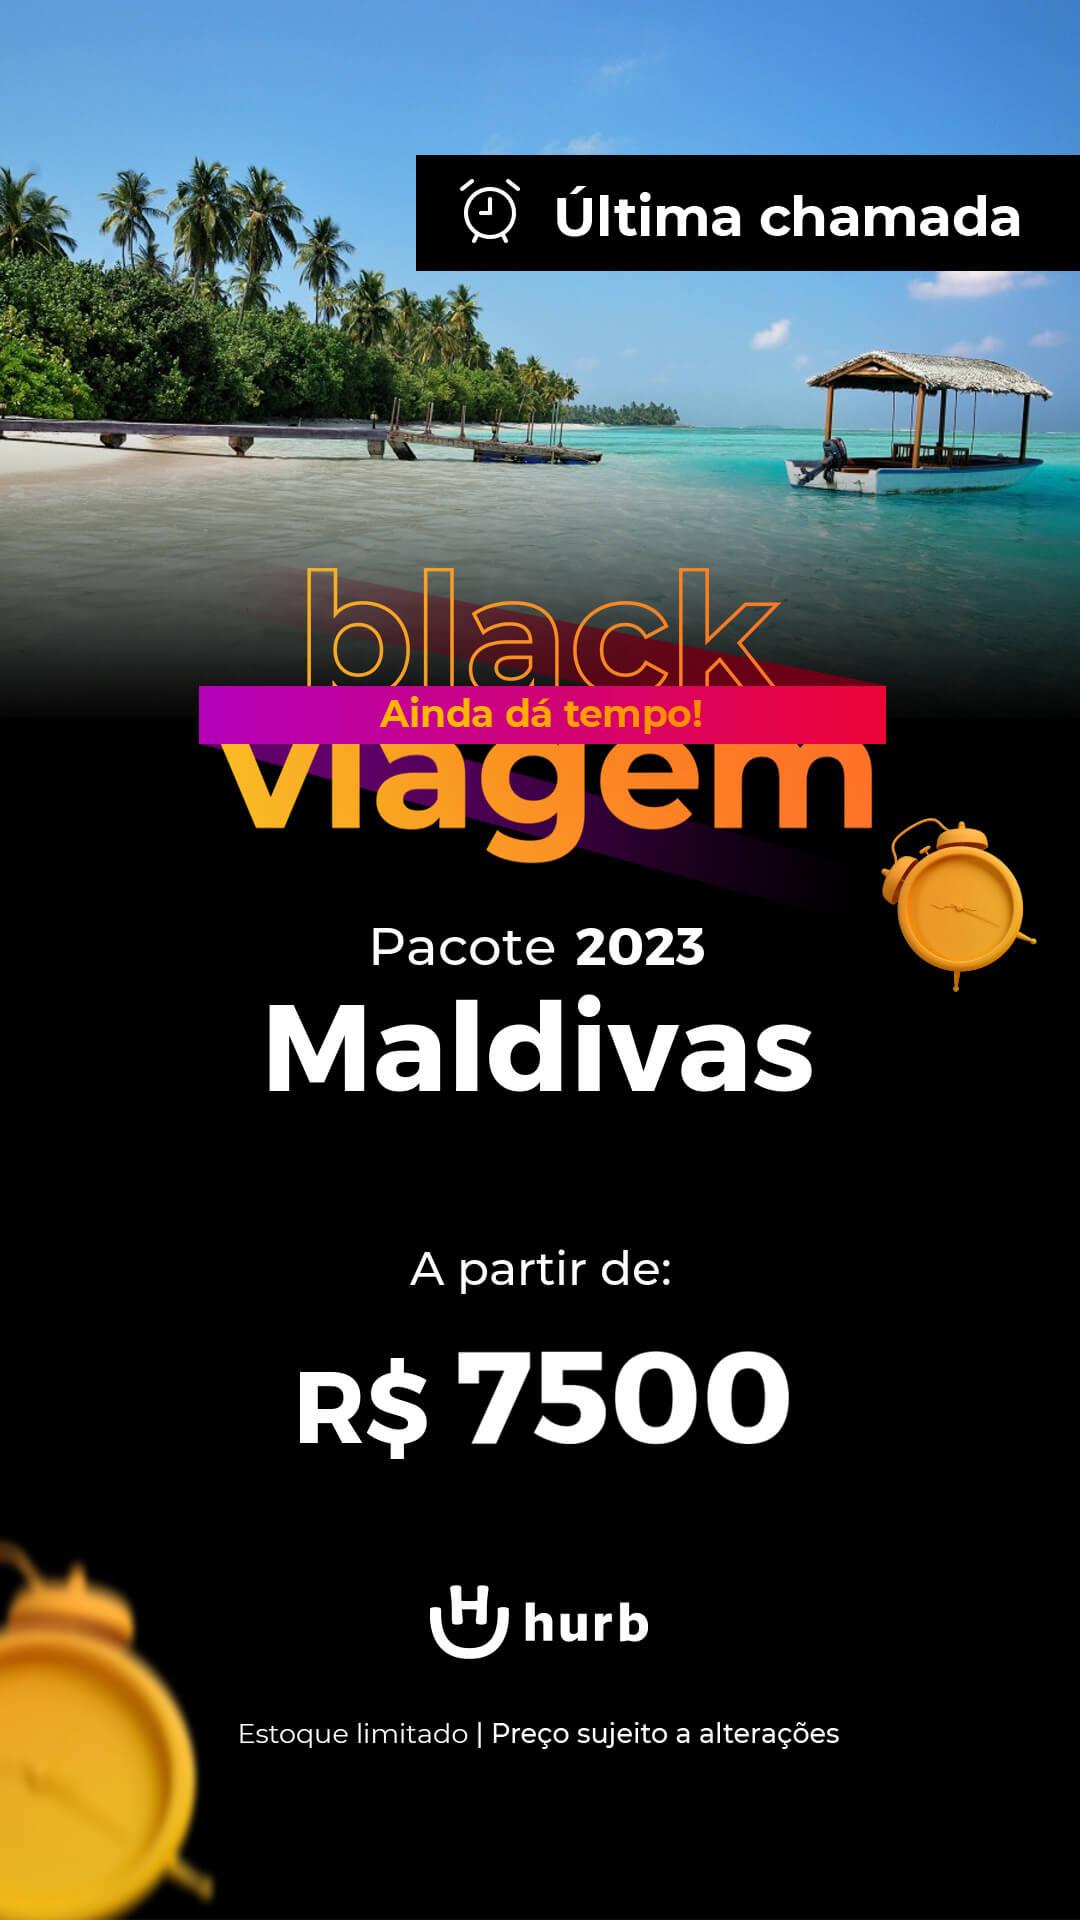 pacote ilhas maldivas 2023